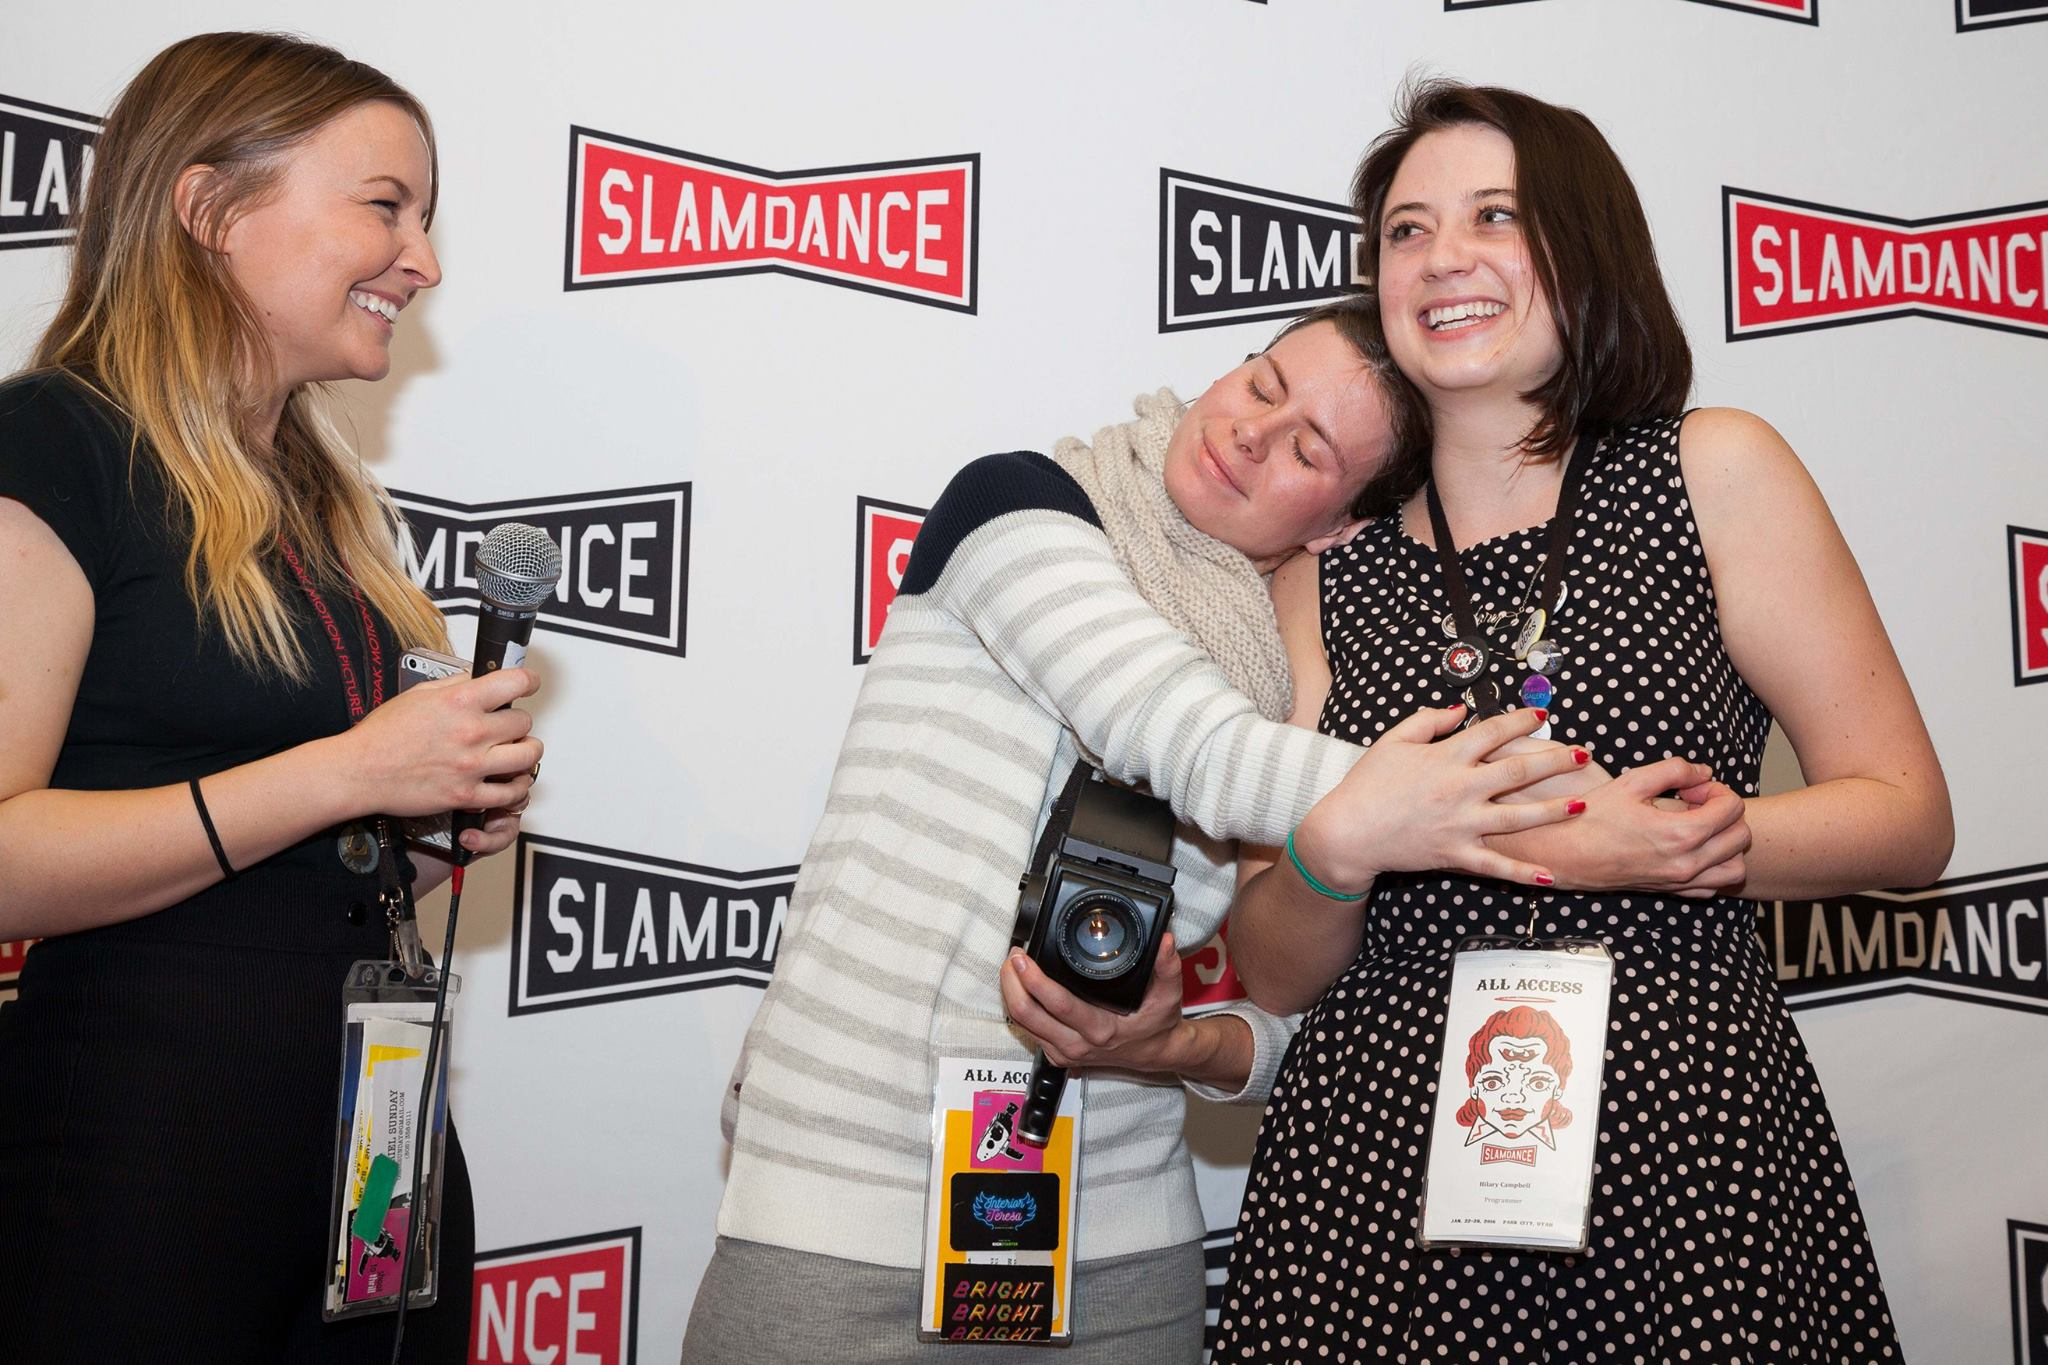 Filmmaker Lindsay Haun & Digital Bolex's Elle Schneider awarding Campbell Grand Prize at Slamdance